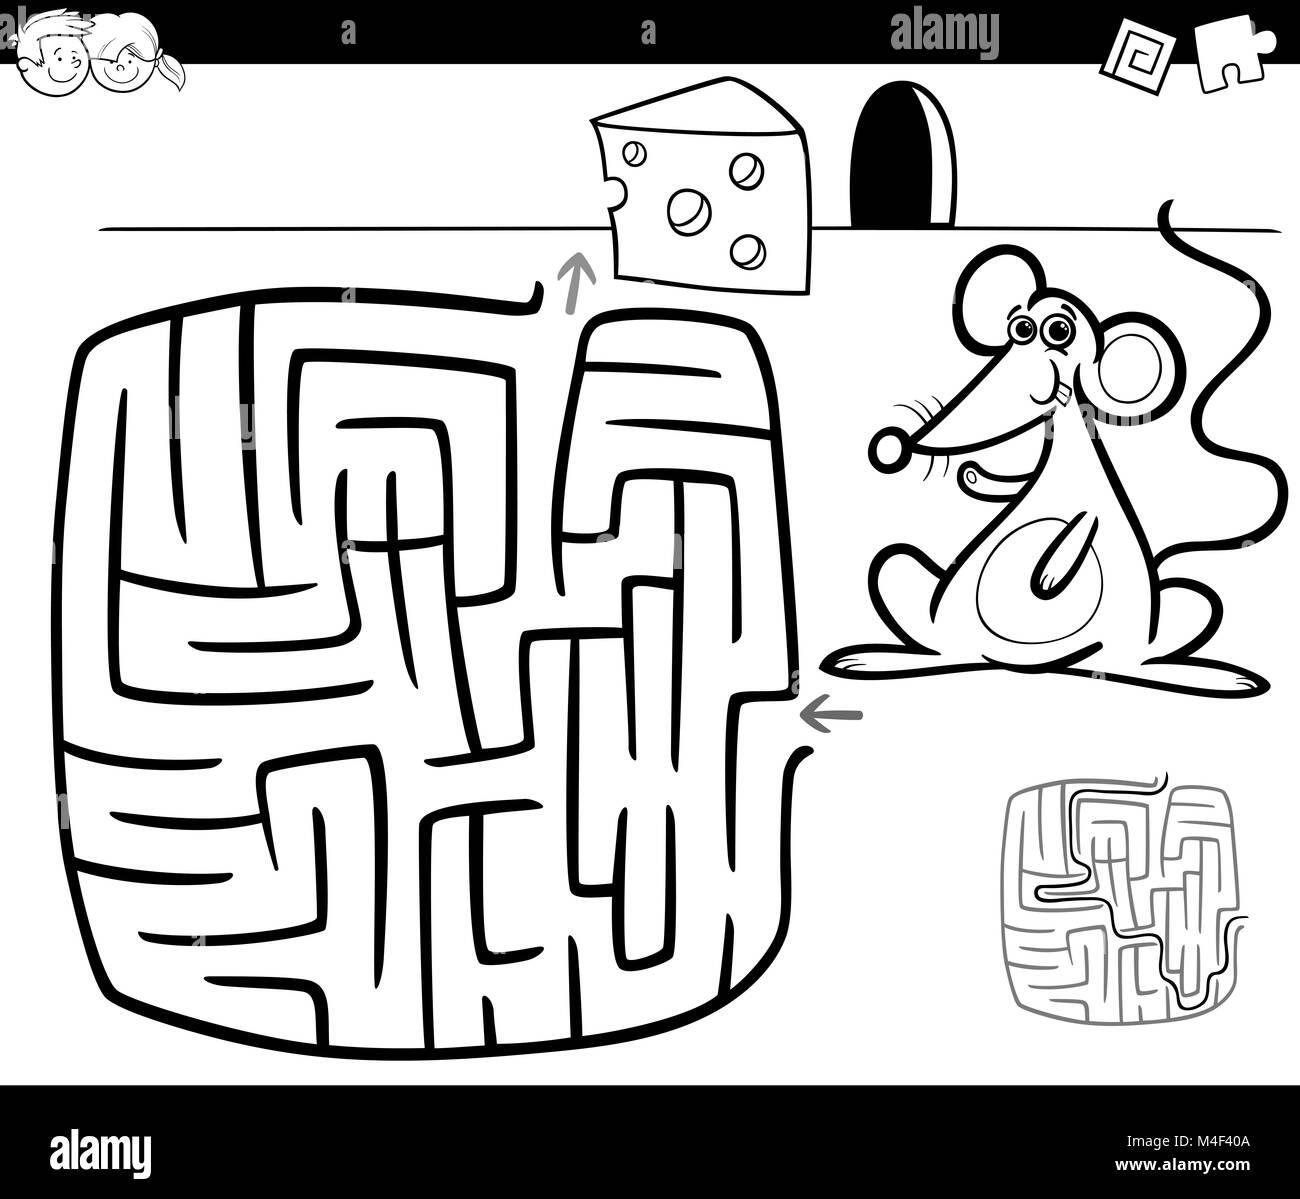 Mouse Maze Stockfotos & Mouse Maze Bilder - Alamy